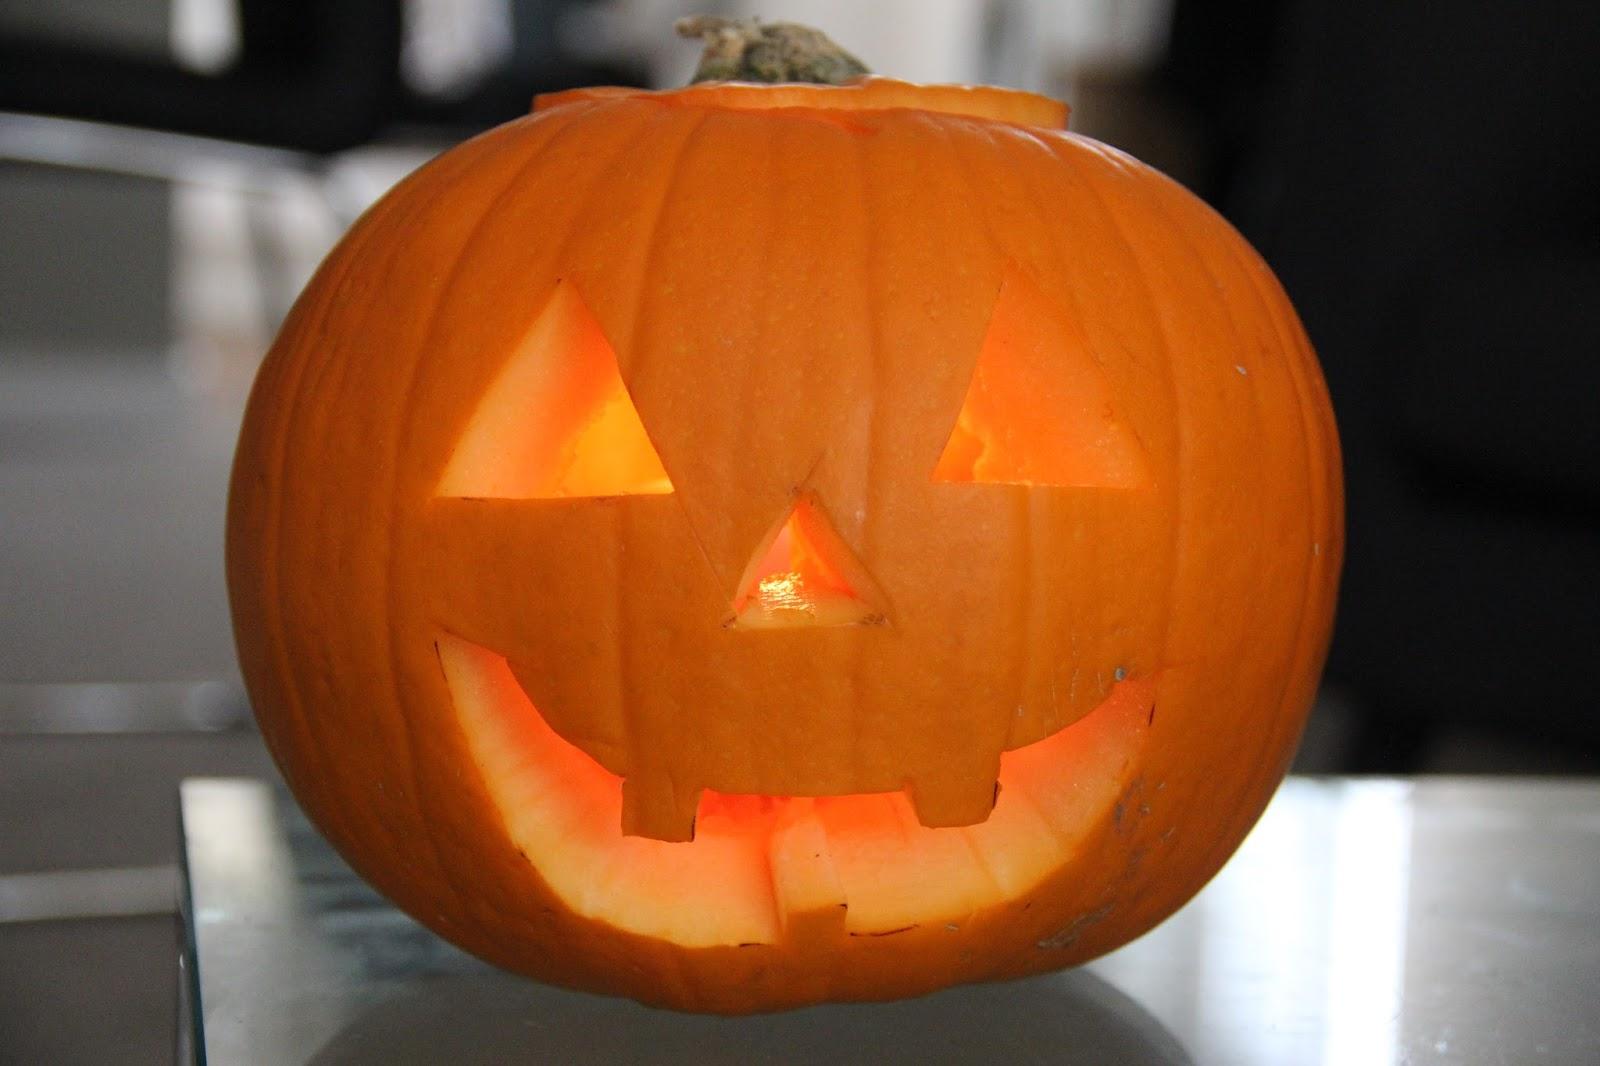 The freshly carved pumpkin.